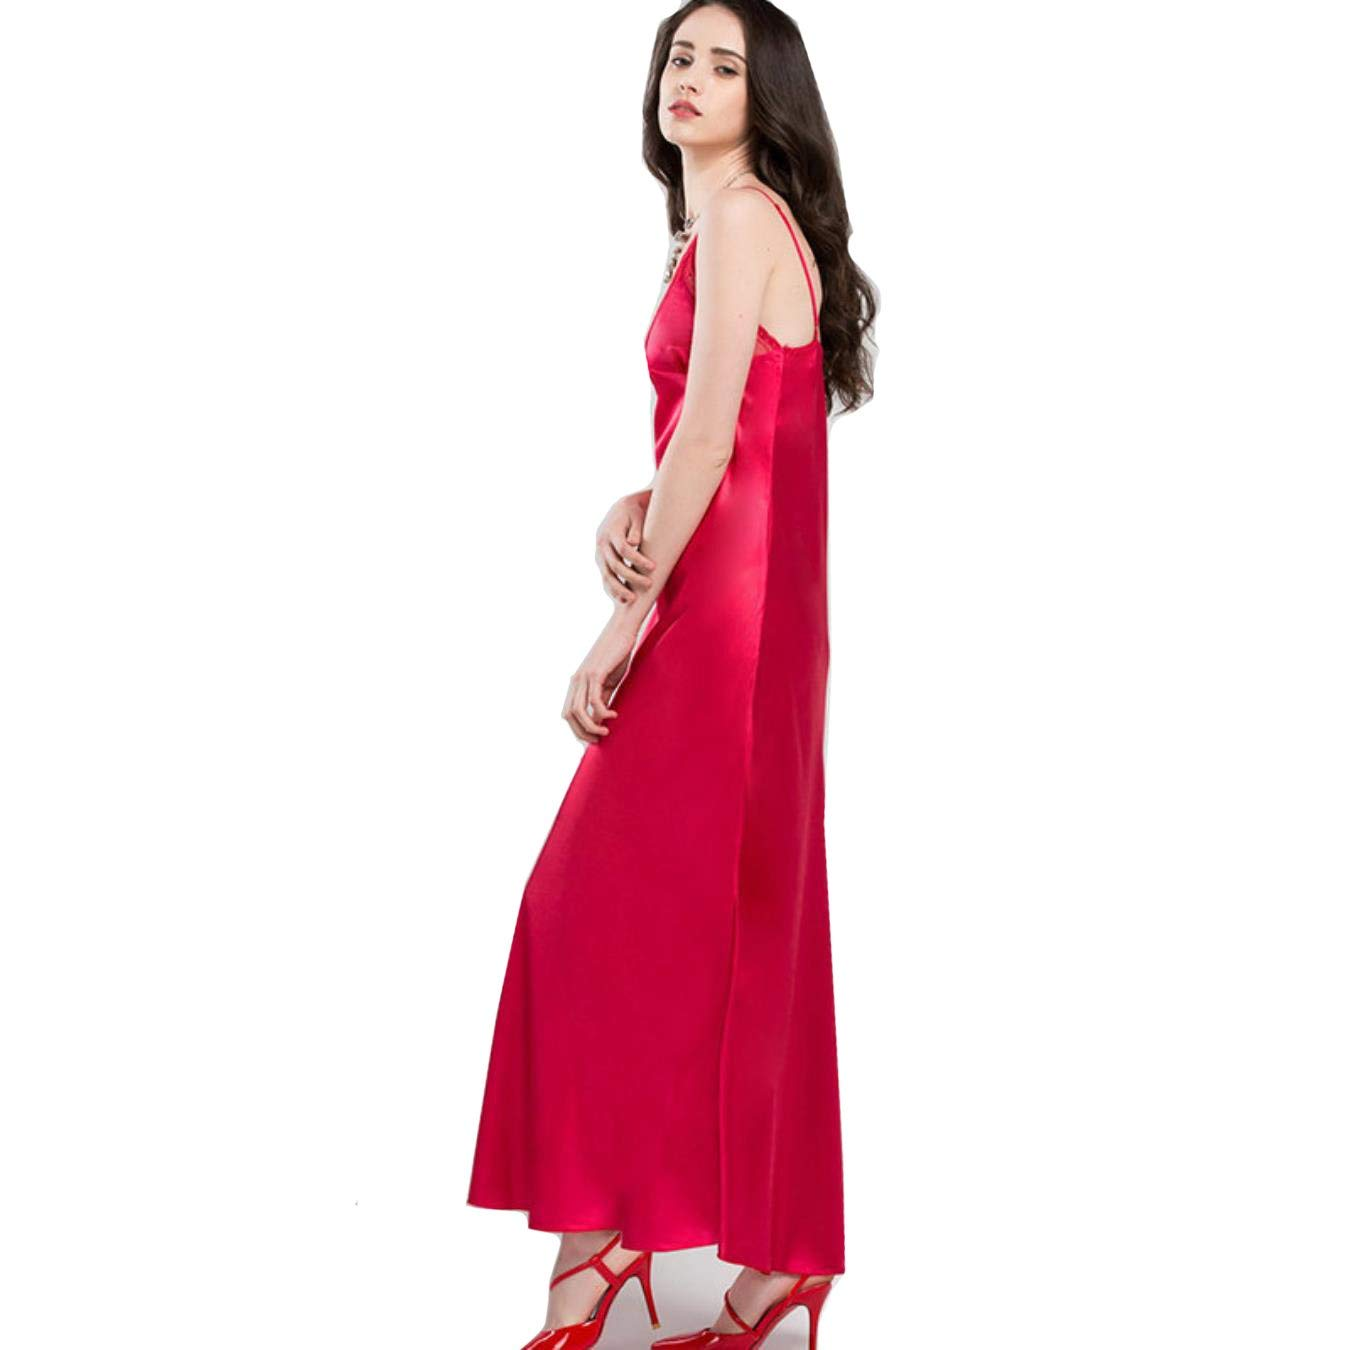 ba27dbfba Get Quotations · NCOEM Lace Sexy V-Neck Sleeveless Sling Sleeping Dress  Satin Silk Sleepwear Women Faux Silk